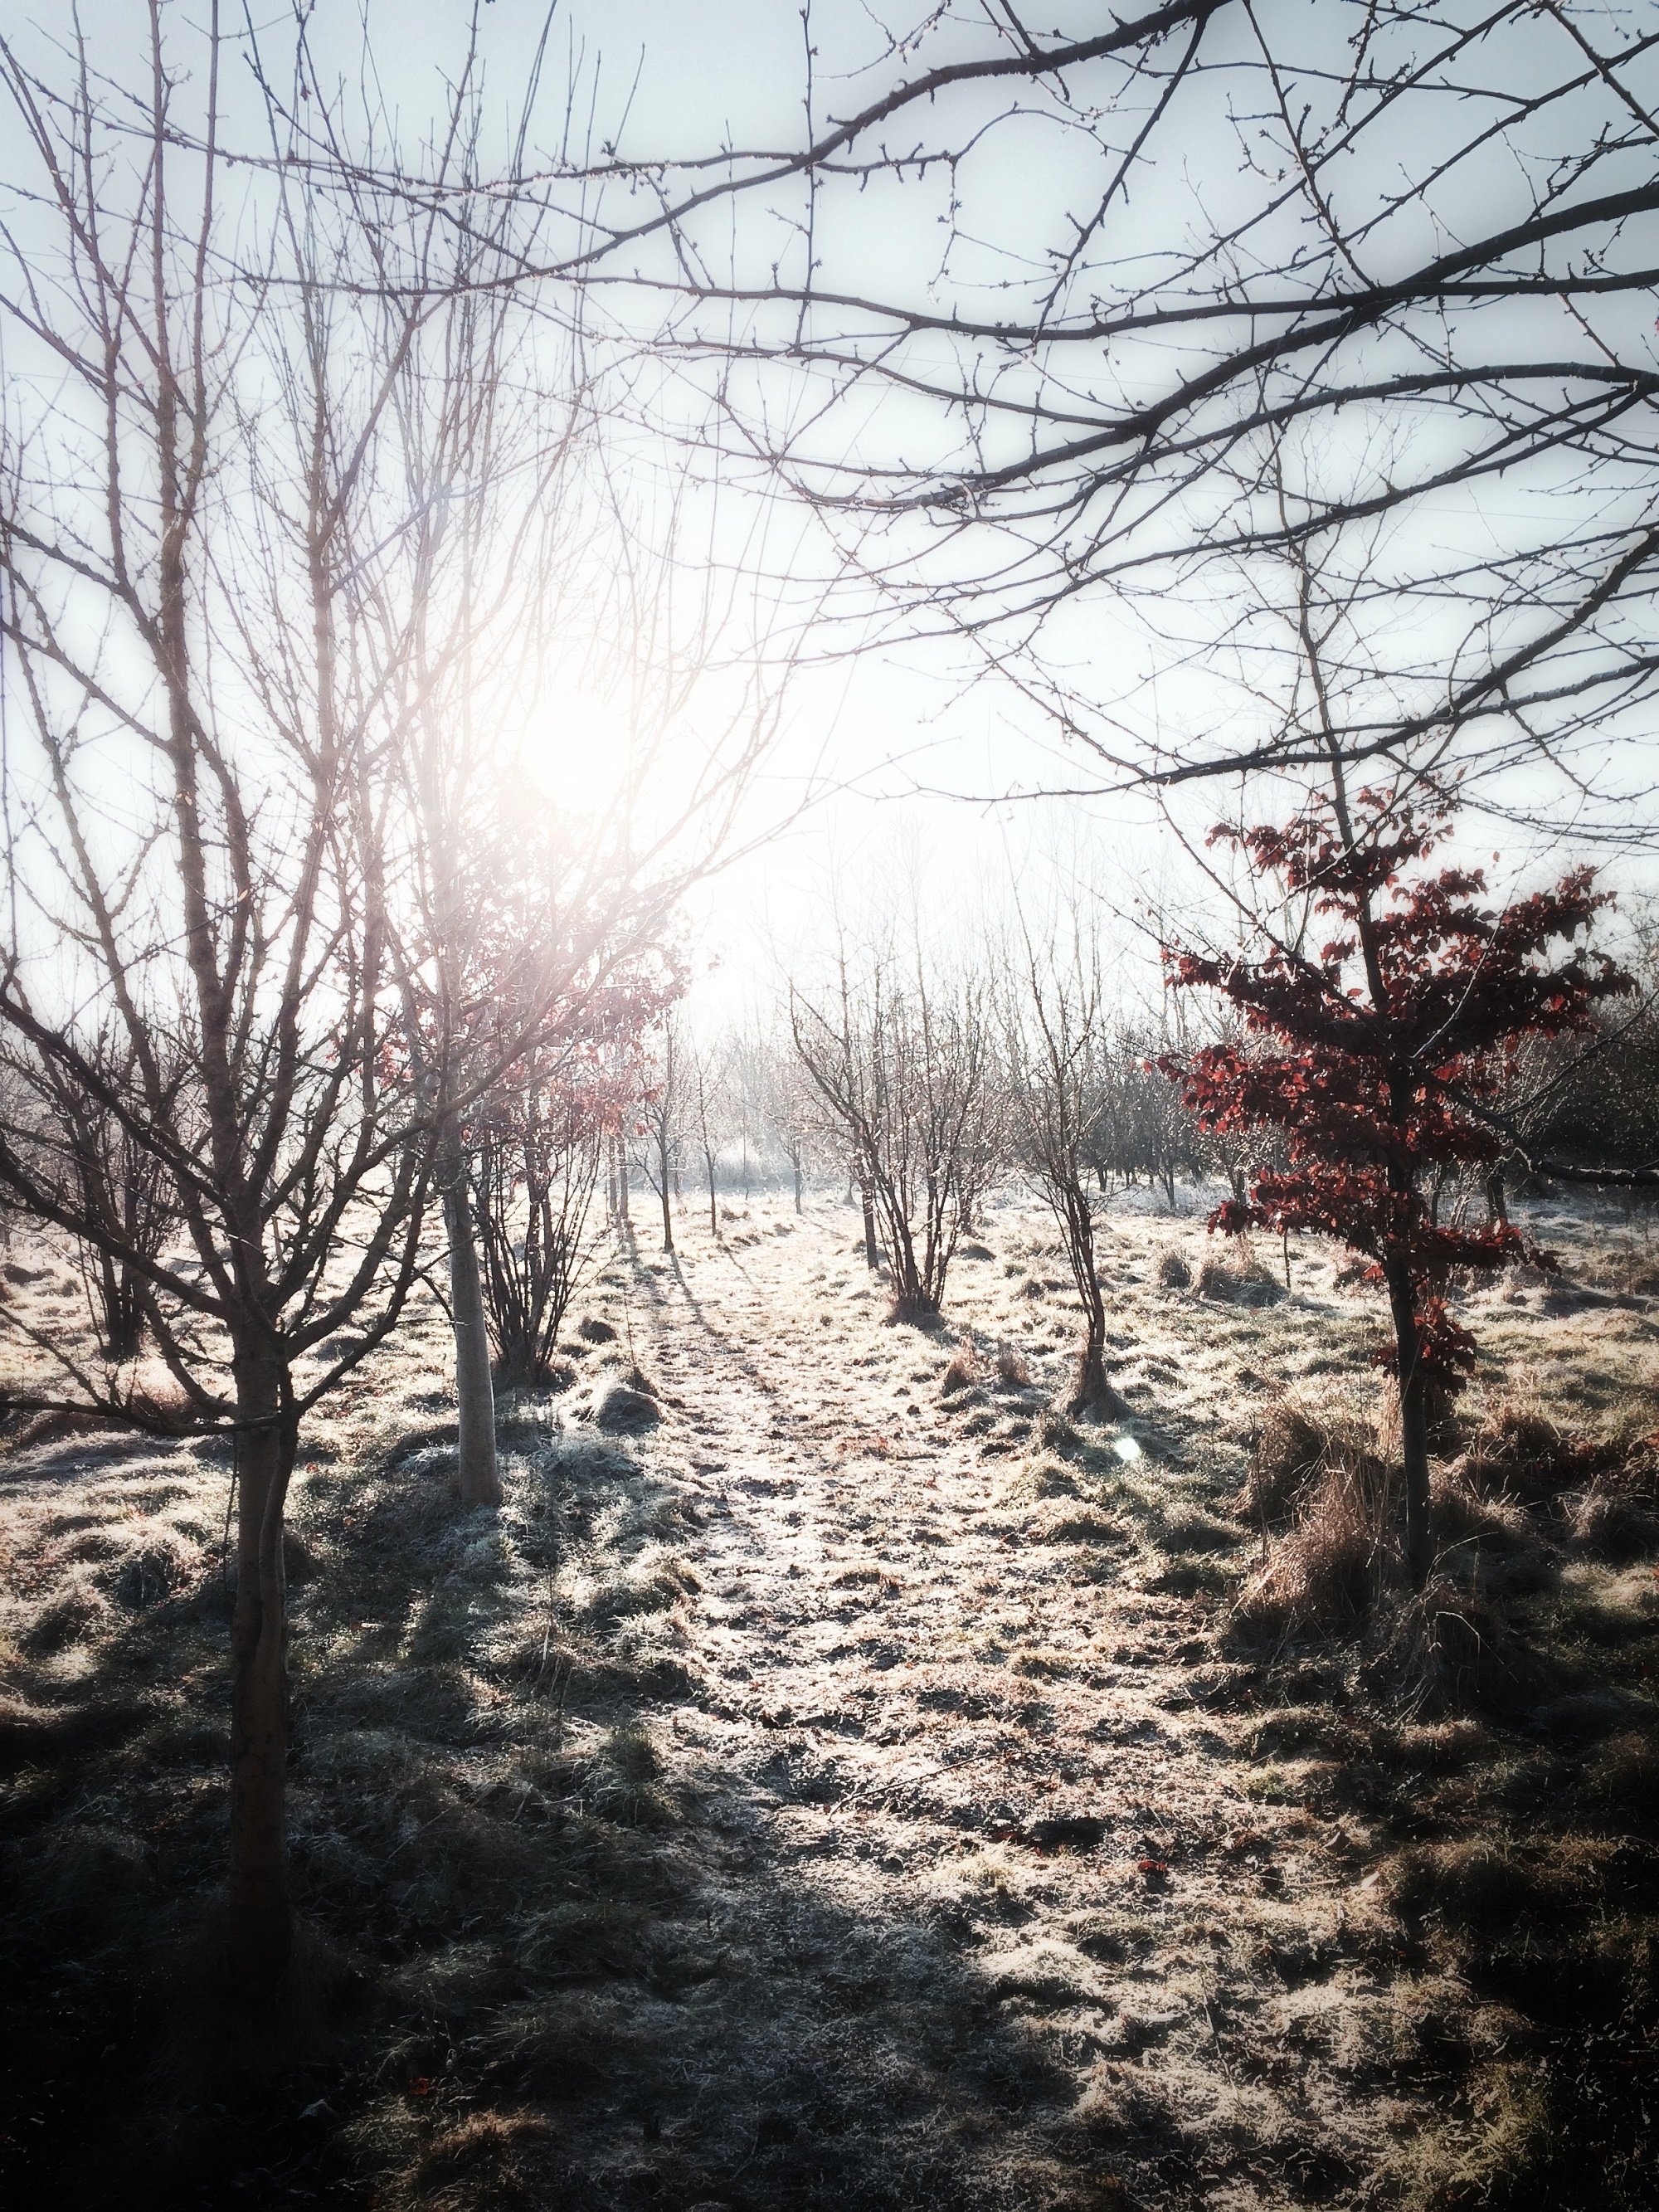 Overcoming Grief on Christmas